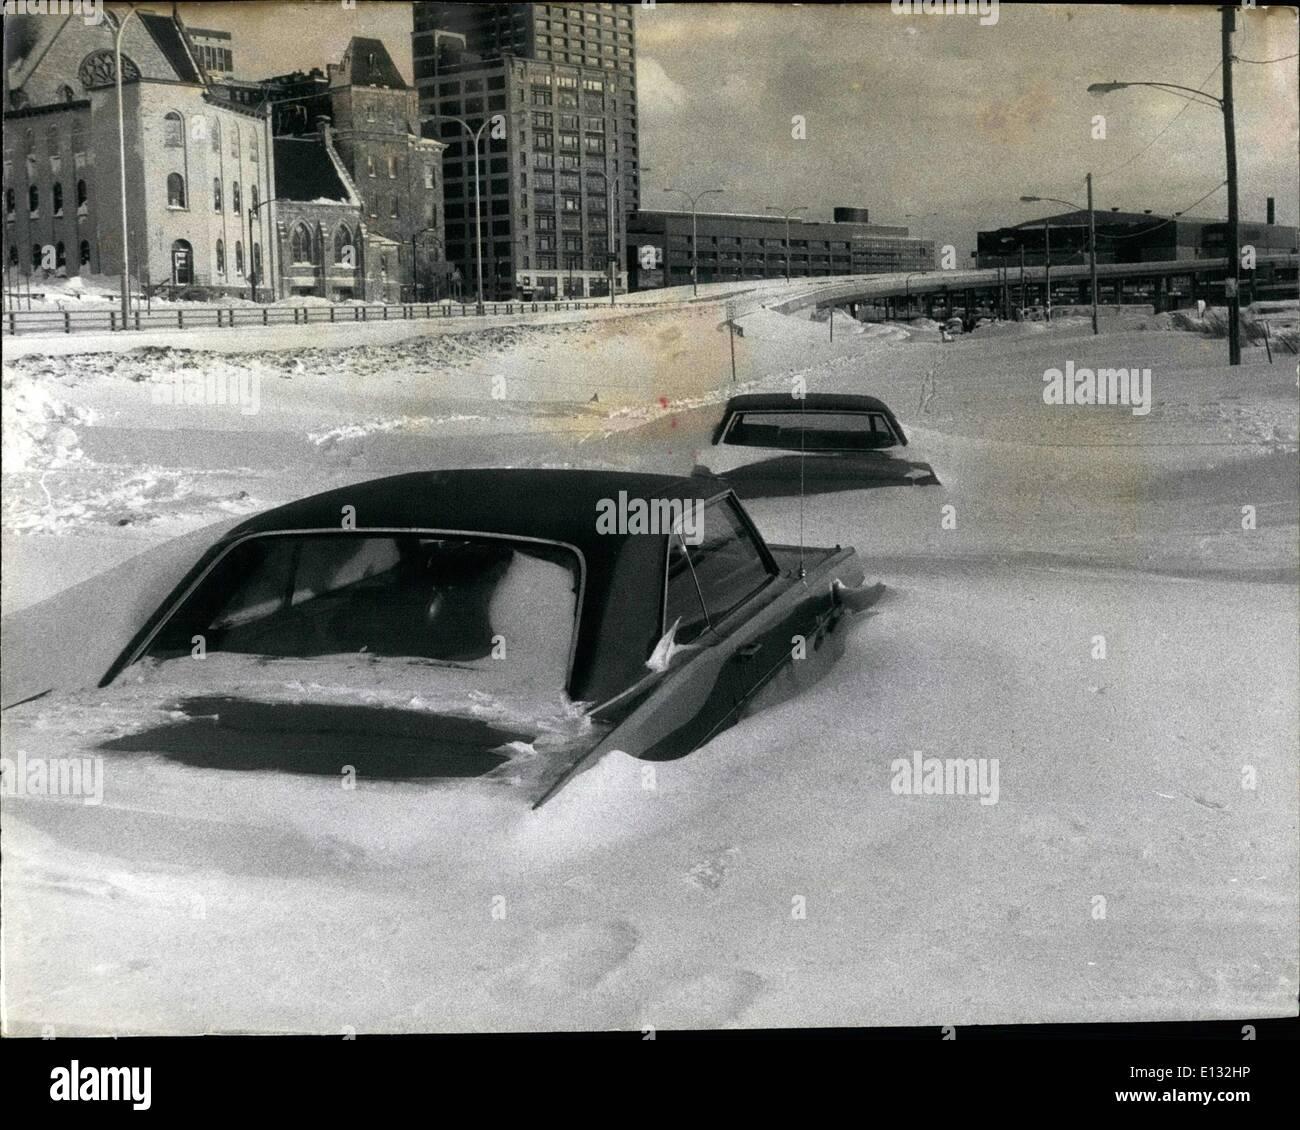 Feb. 26, 2012 - Buffalo, N.Y. snowed in. - Stock Image